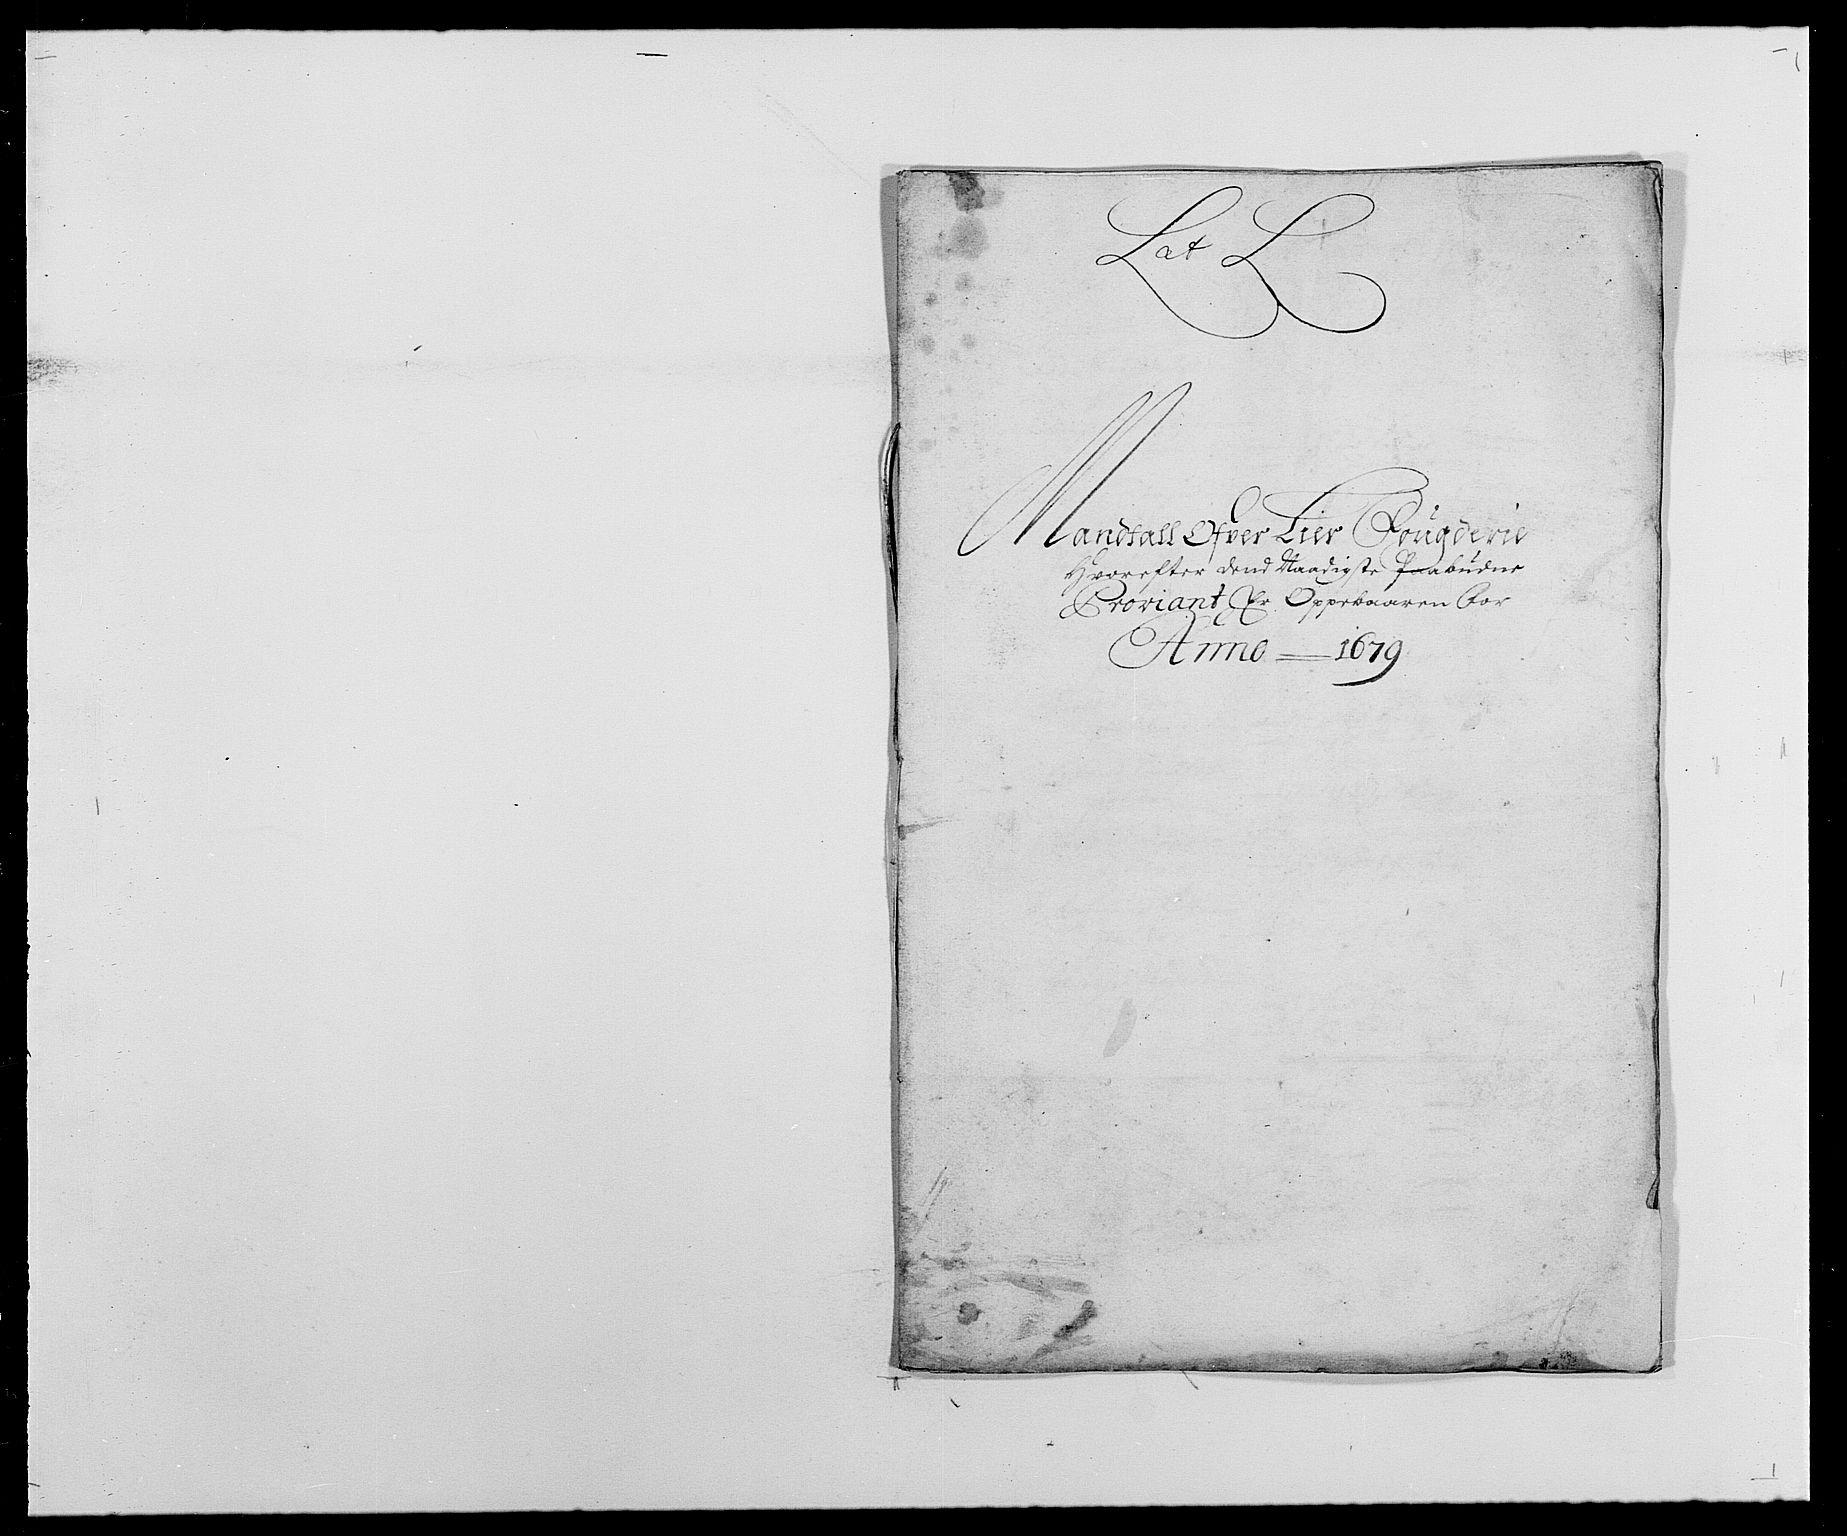 RA, Rentekammeret inntil 1814, Reviderte regnskaper, Fogderegnskap, R27/L1686: Fogderegnskap Lier, 1678-1686, s. 163